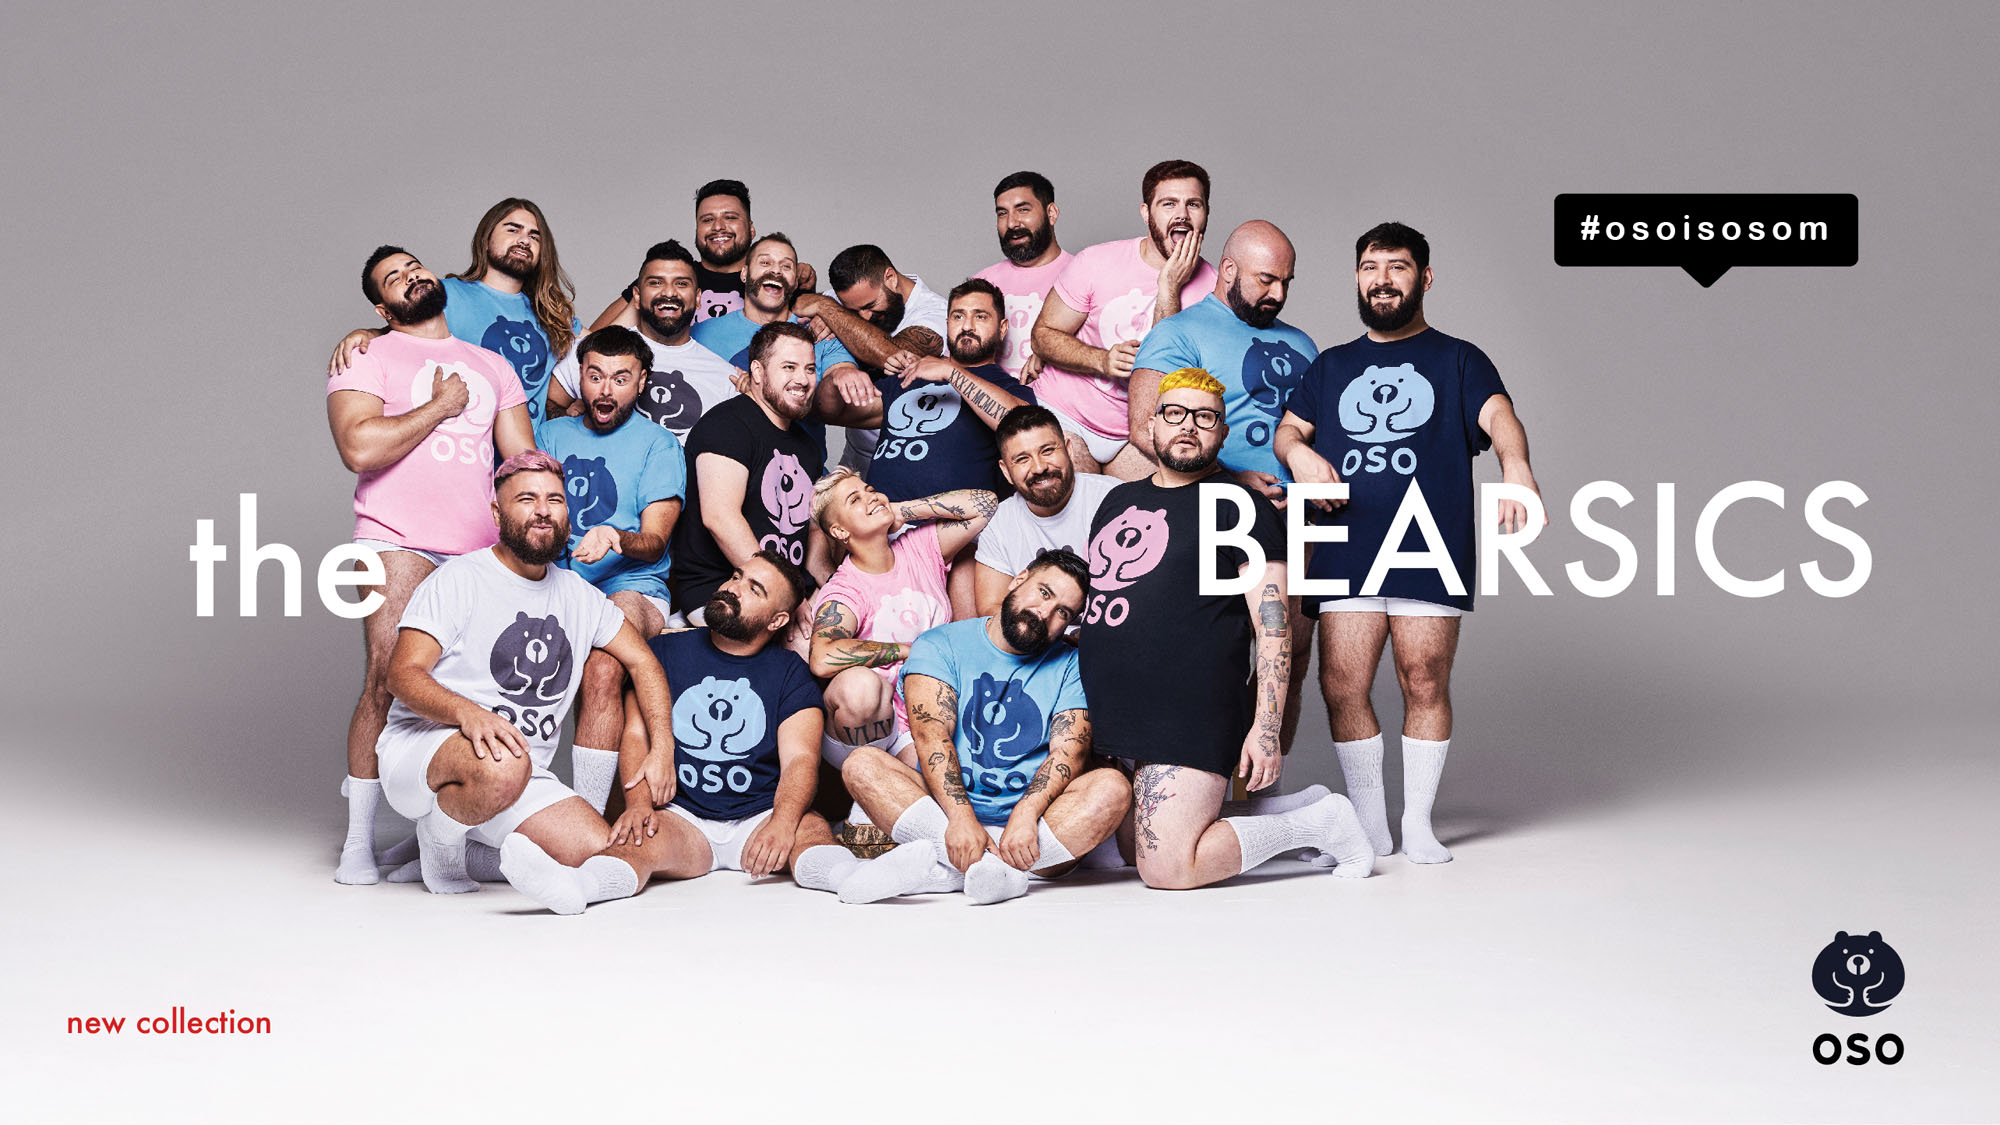 bearsics_editorial-1.jpg